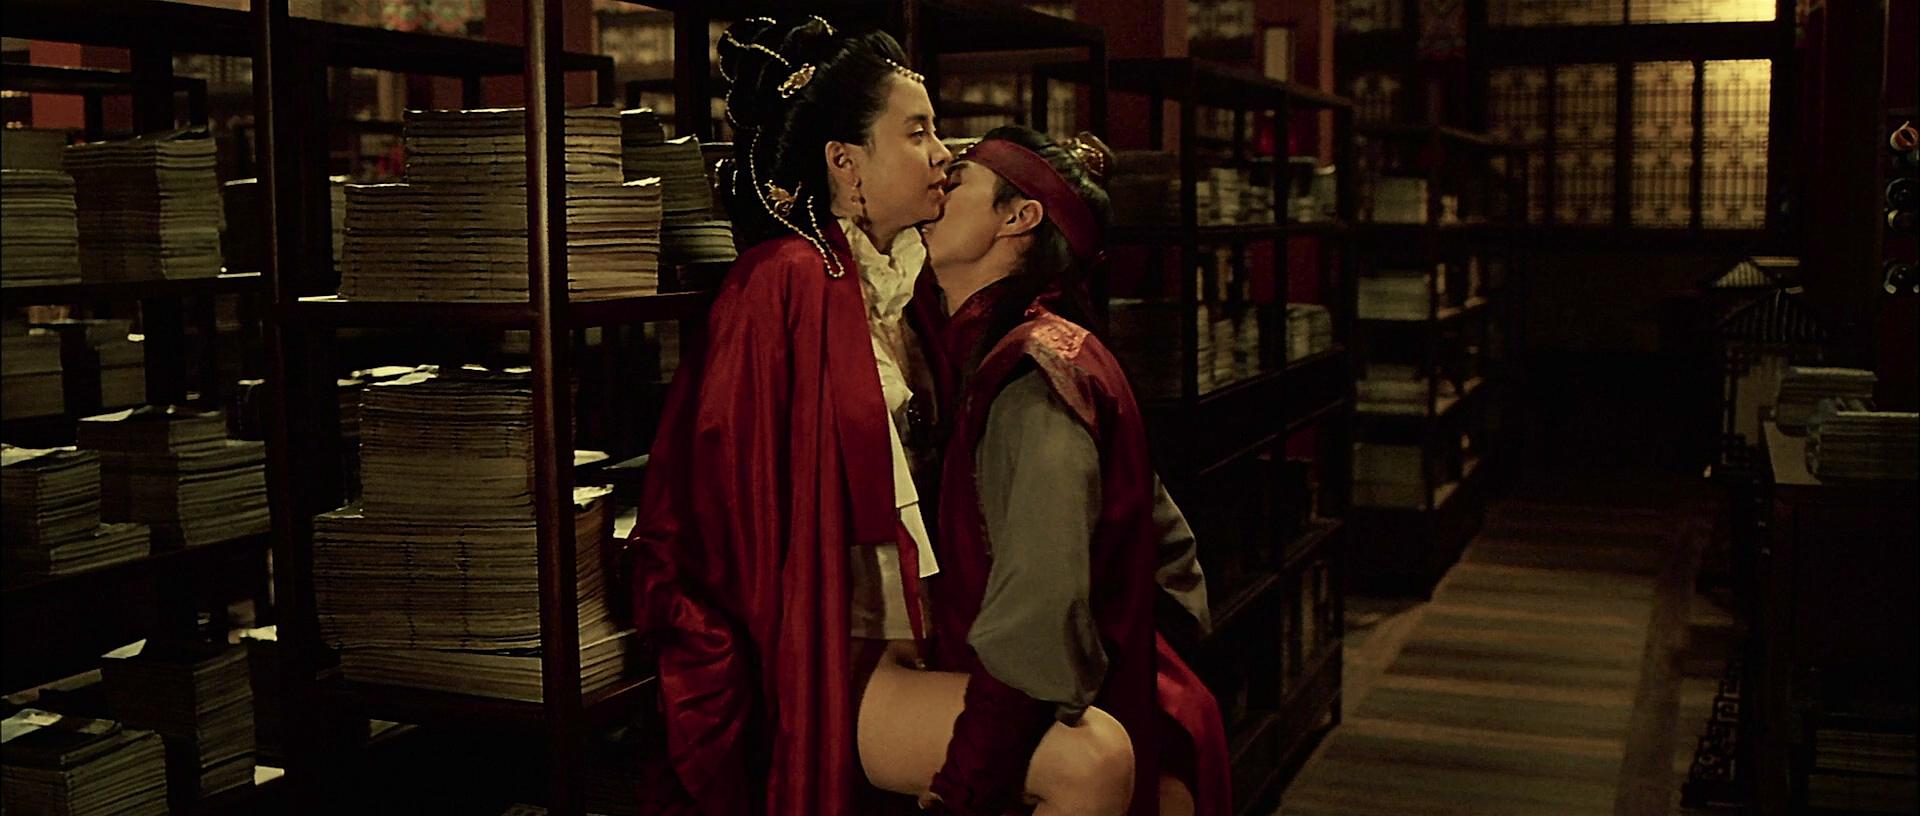 Ji-hyo Song nude topless butt and lot of hot sex - A Frozen Flower (KR-2008) HD 1080p BluRay (1)